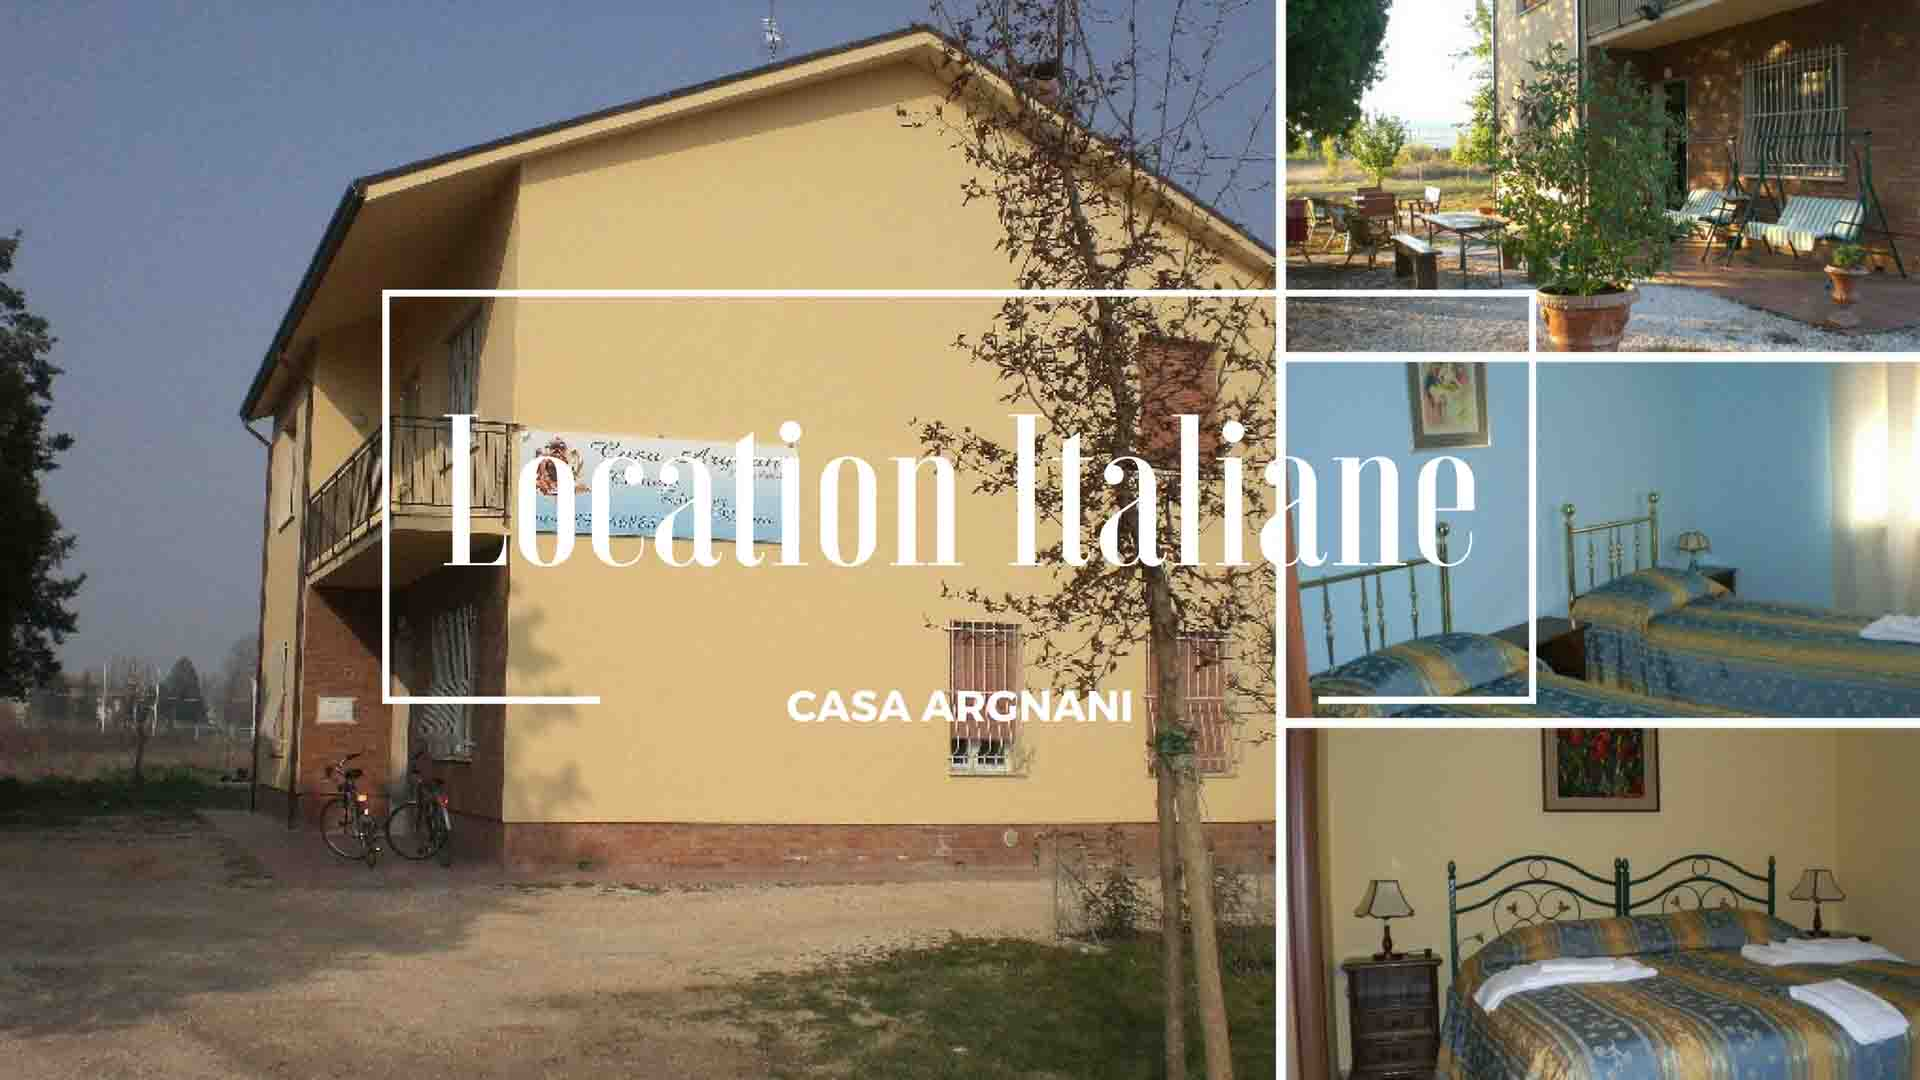 Casa Argnani affittacamere Faenza